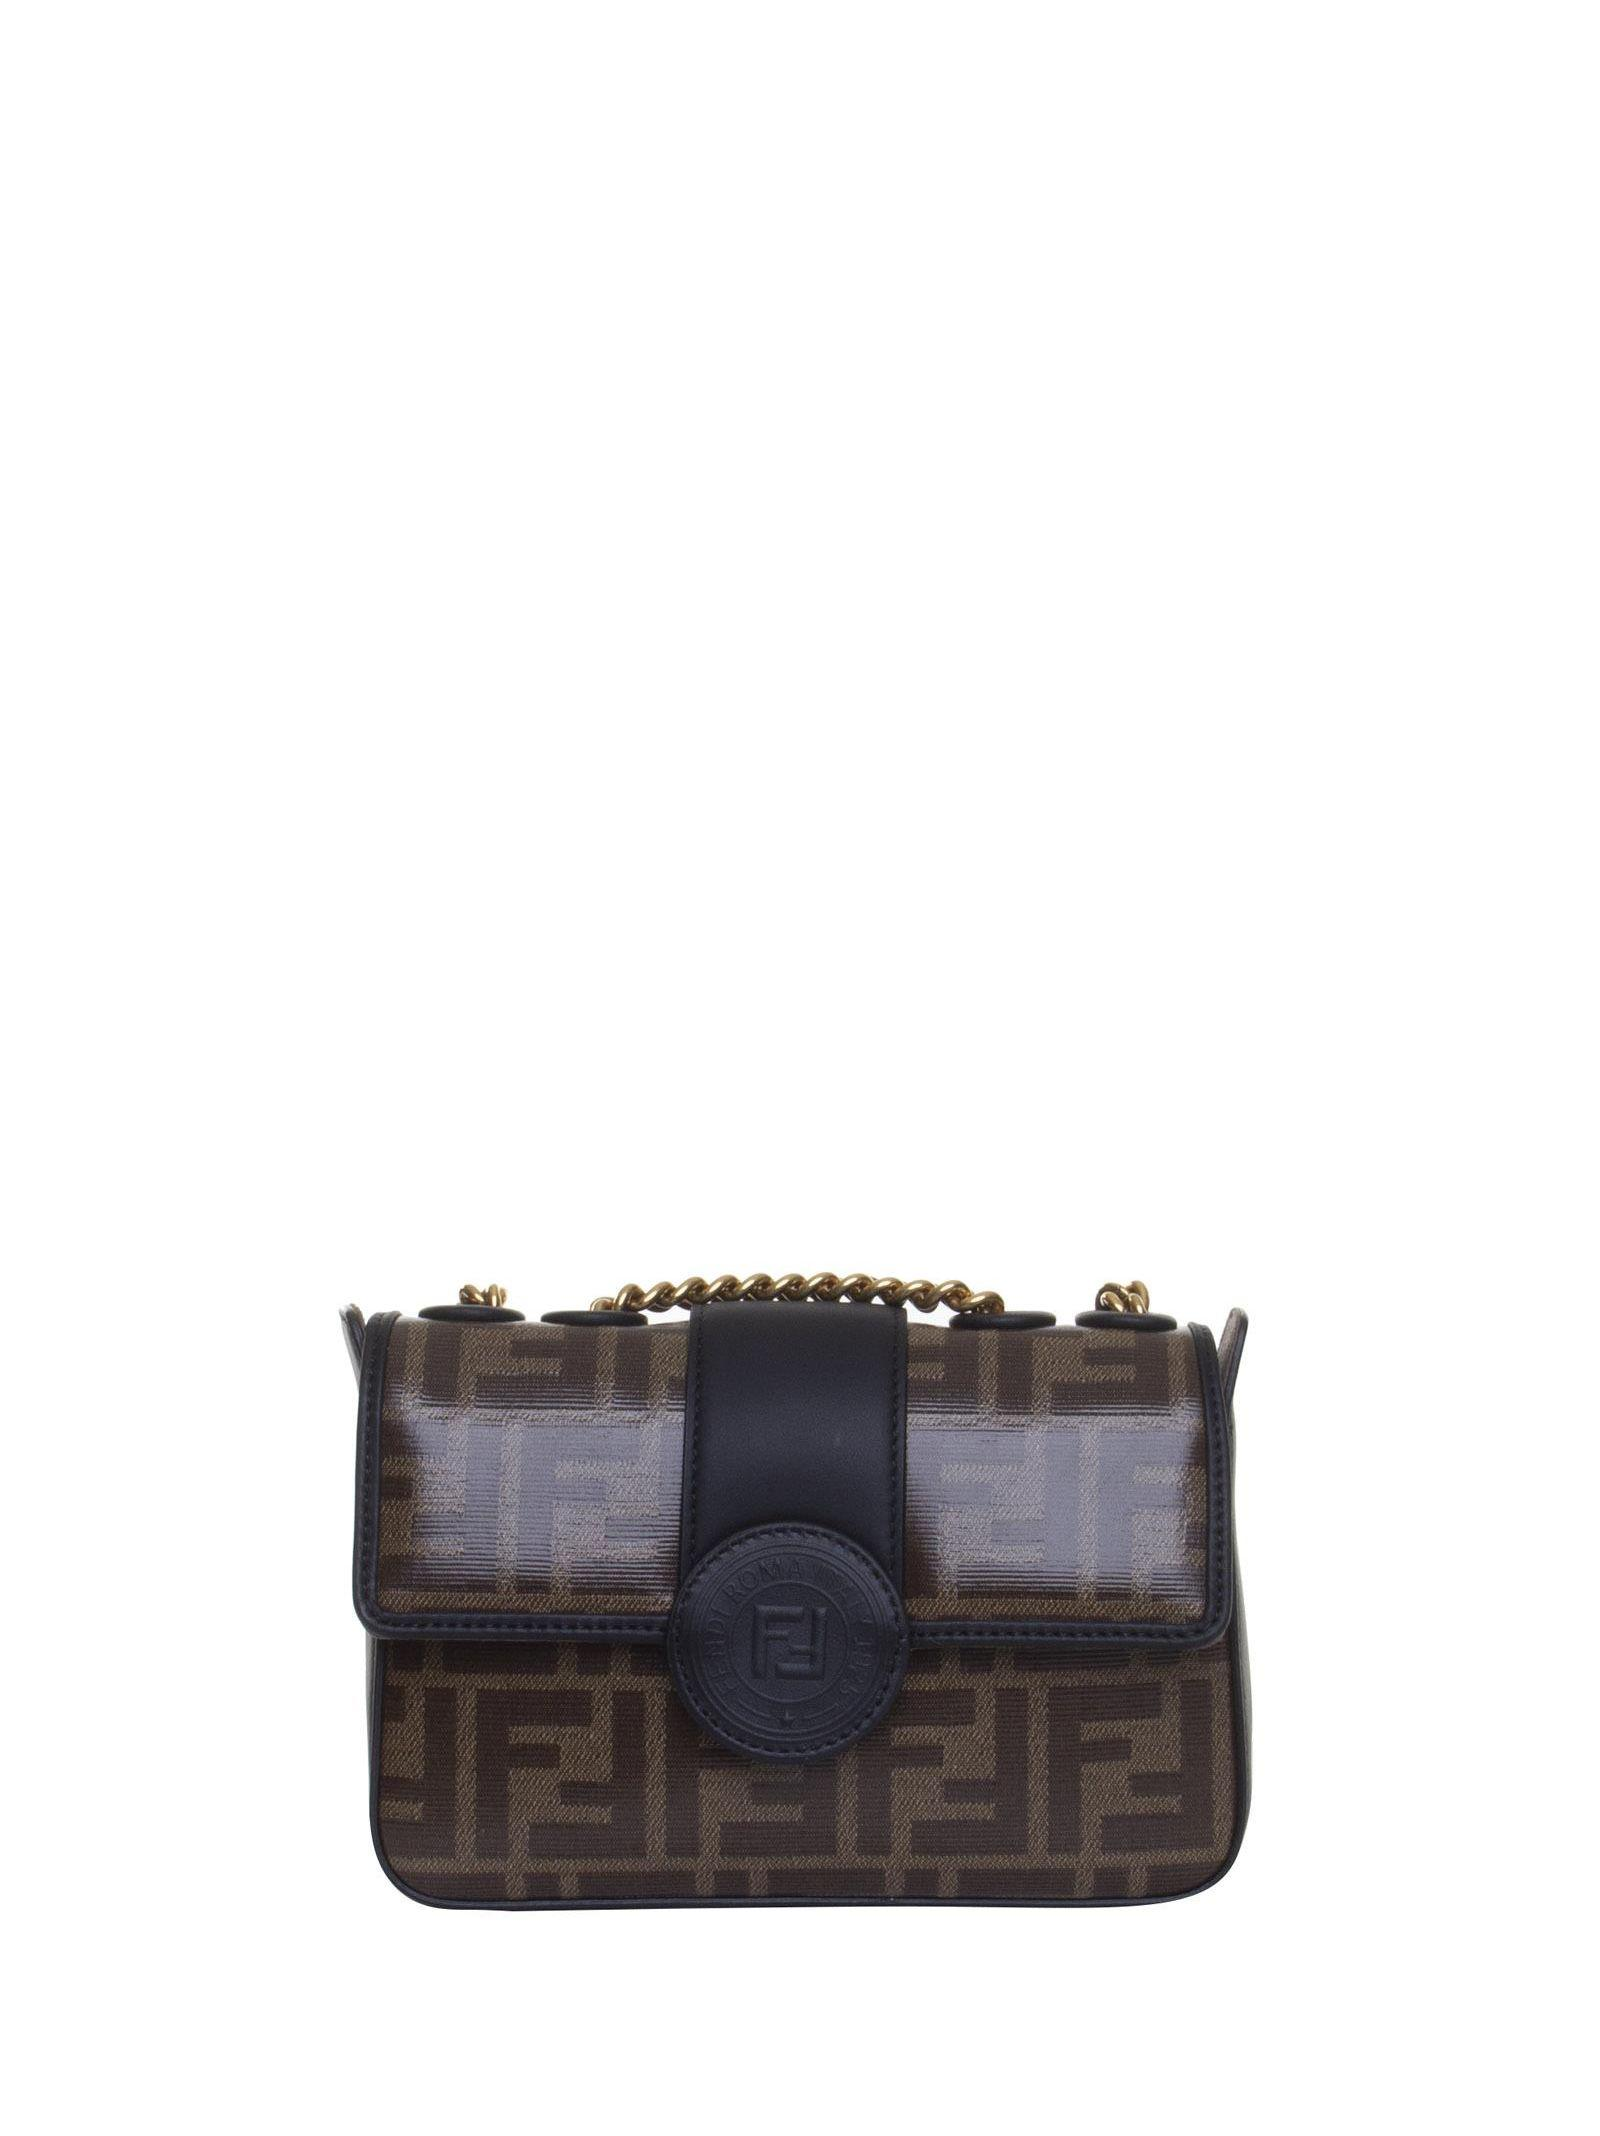 6af94c2774 Fendi Double F Mini Bag In Nero